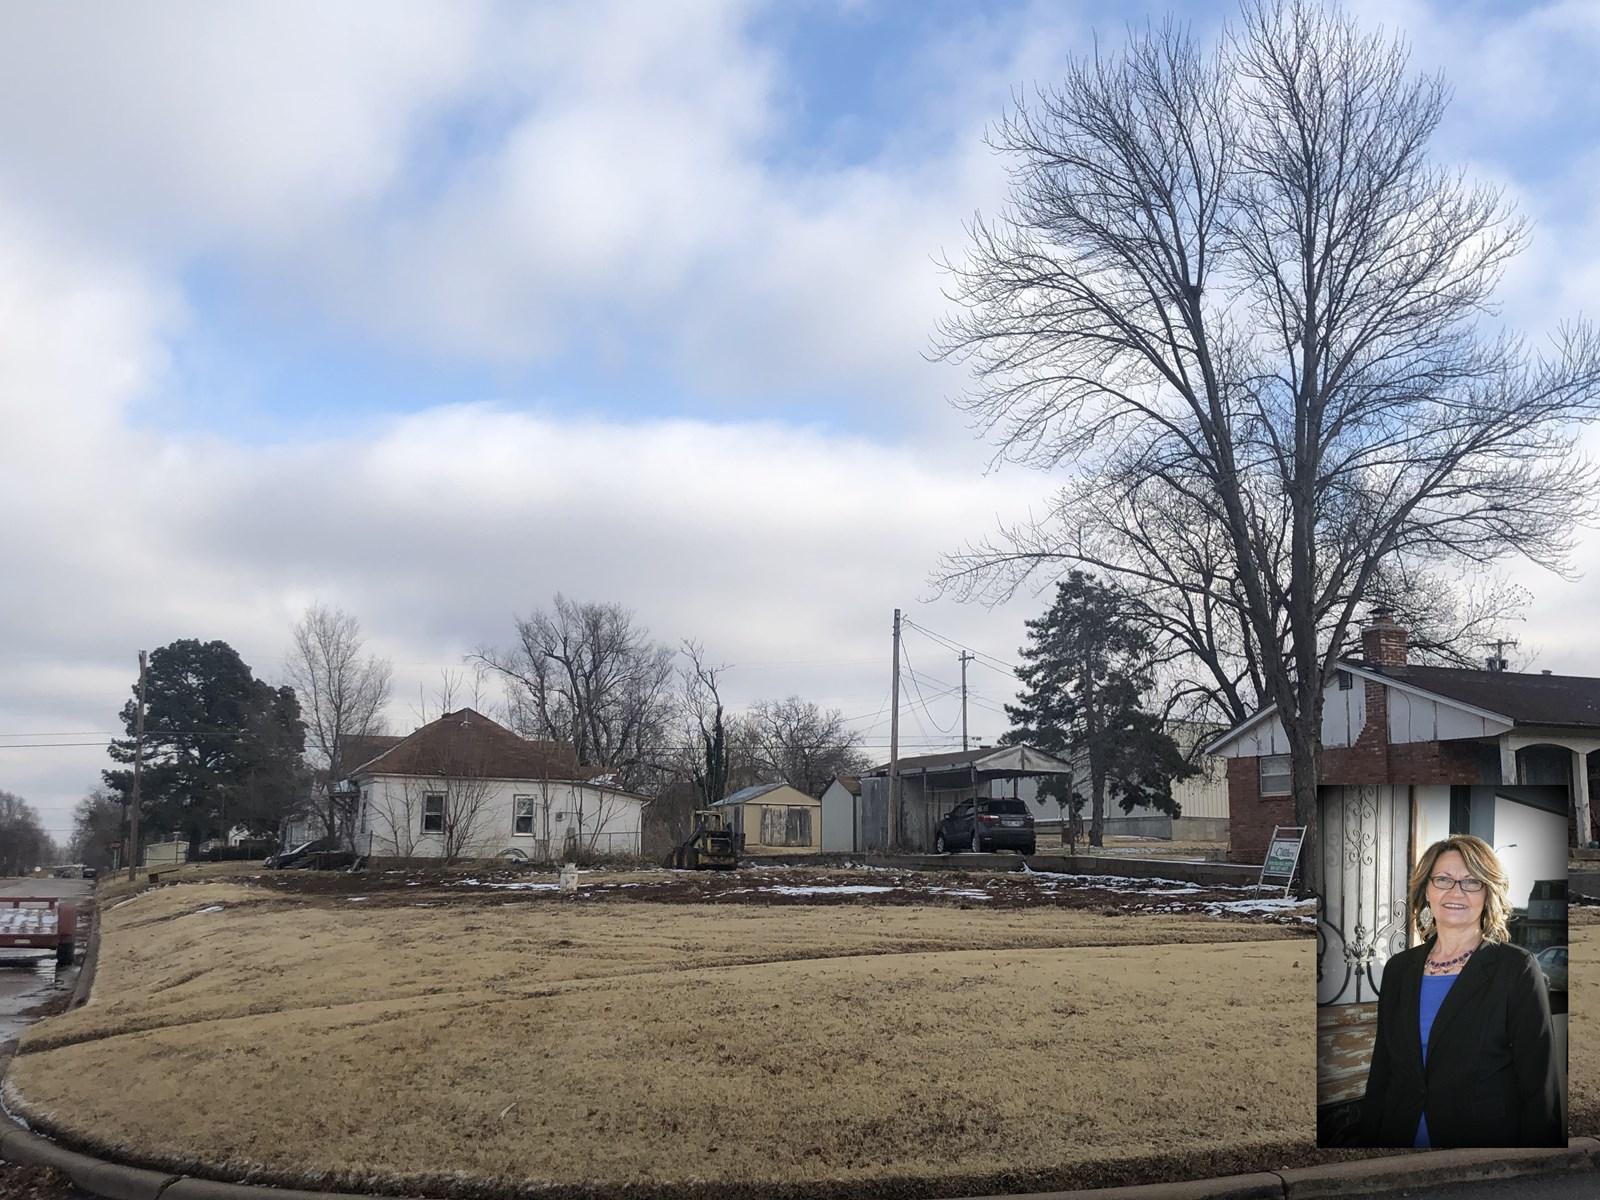 Home for Sale Alva, OK  (Woods County)